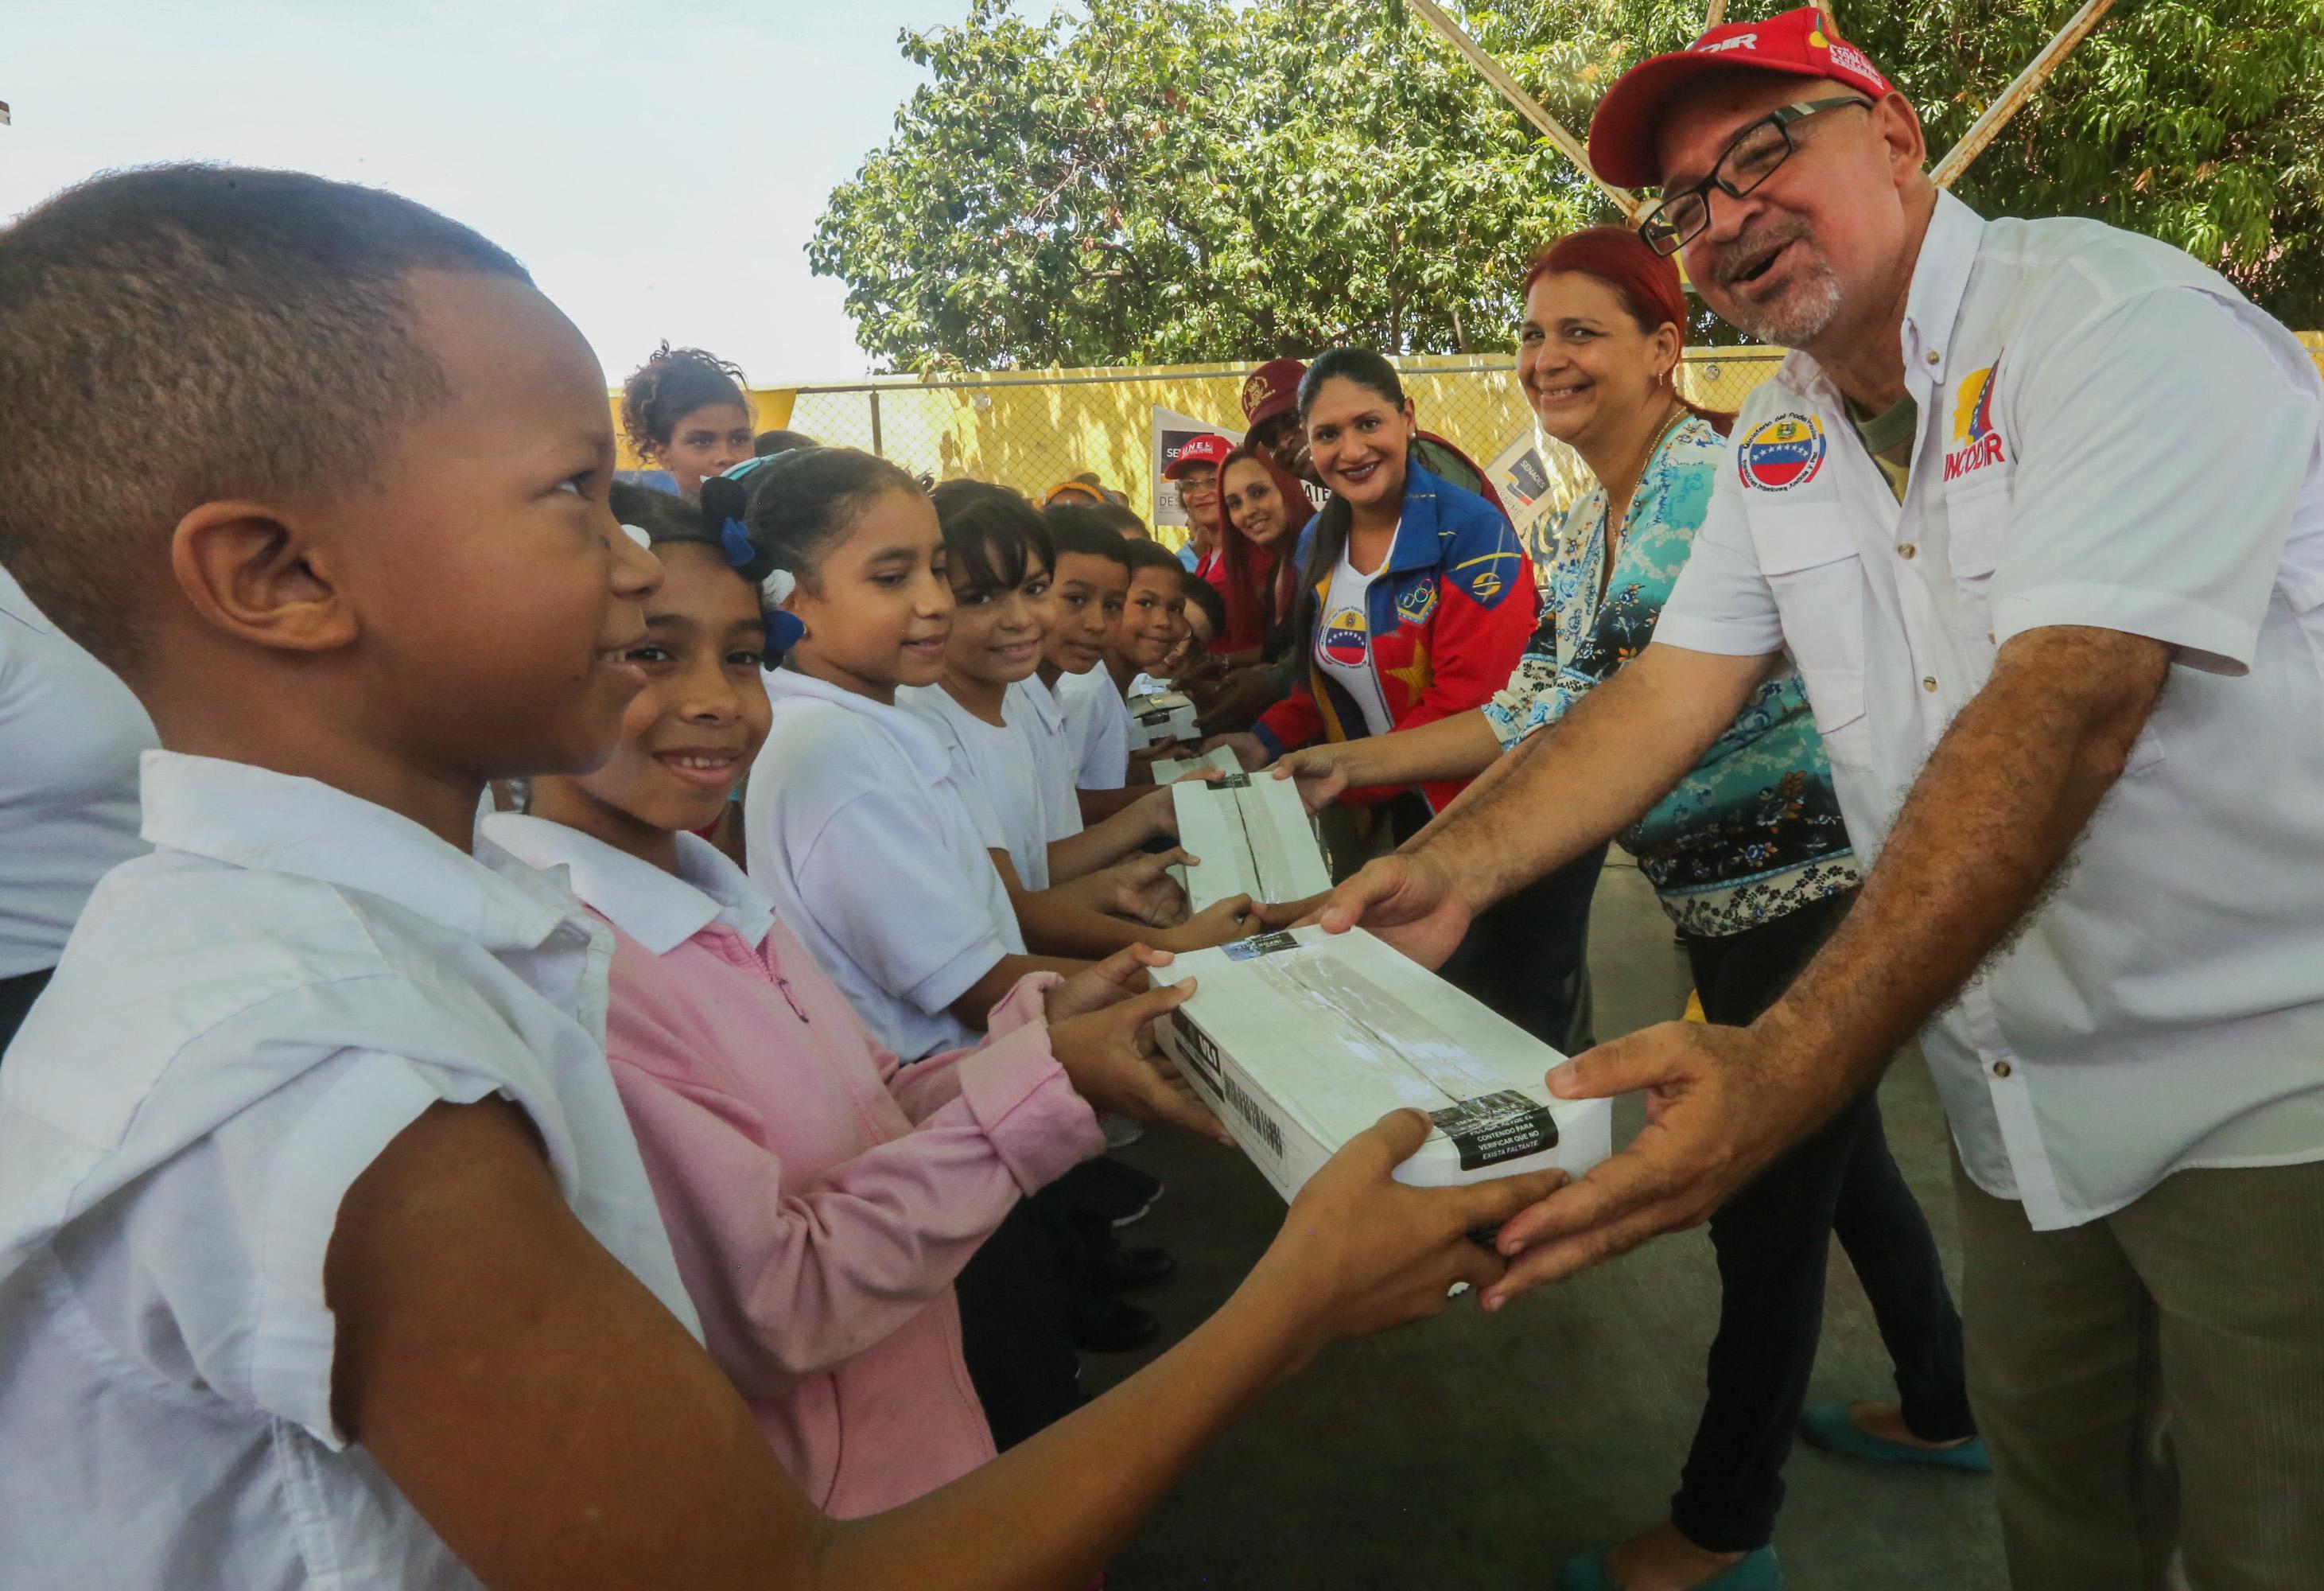 Frente Preventivo entregó útiles escolares a más de mil estudiantes guaireños (12)